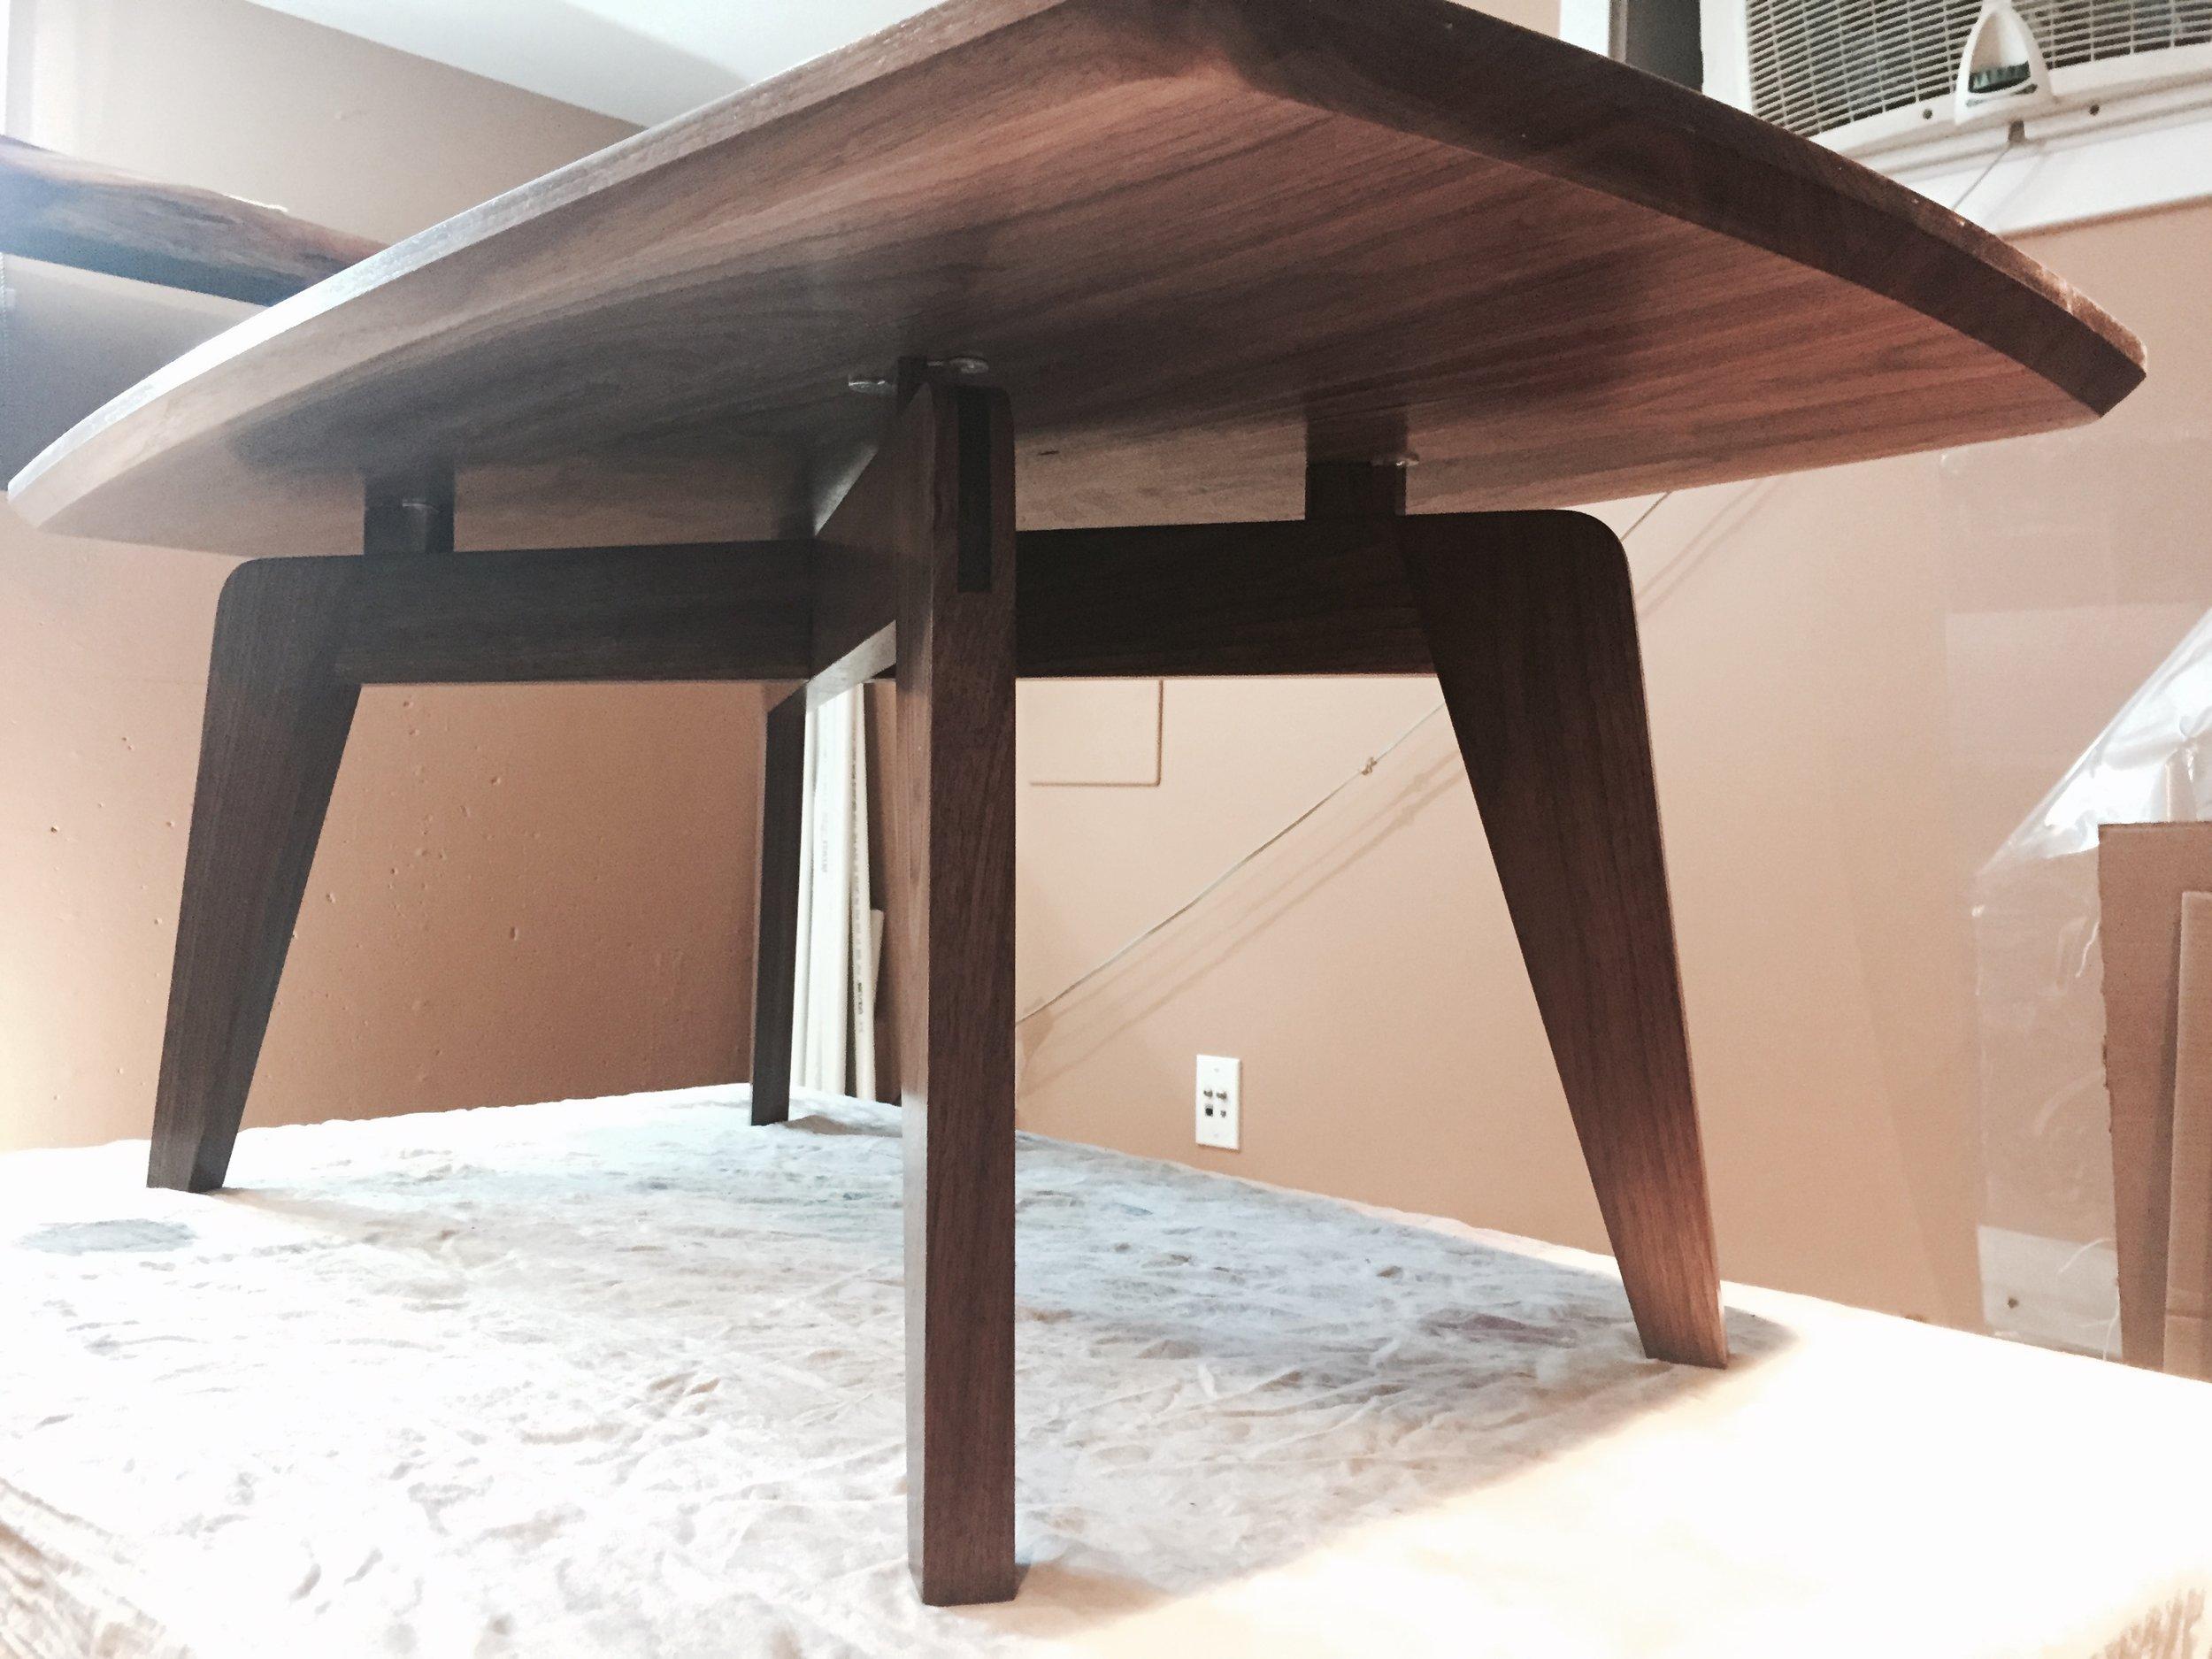 kate-coffee-table_23423334583_o.jpg